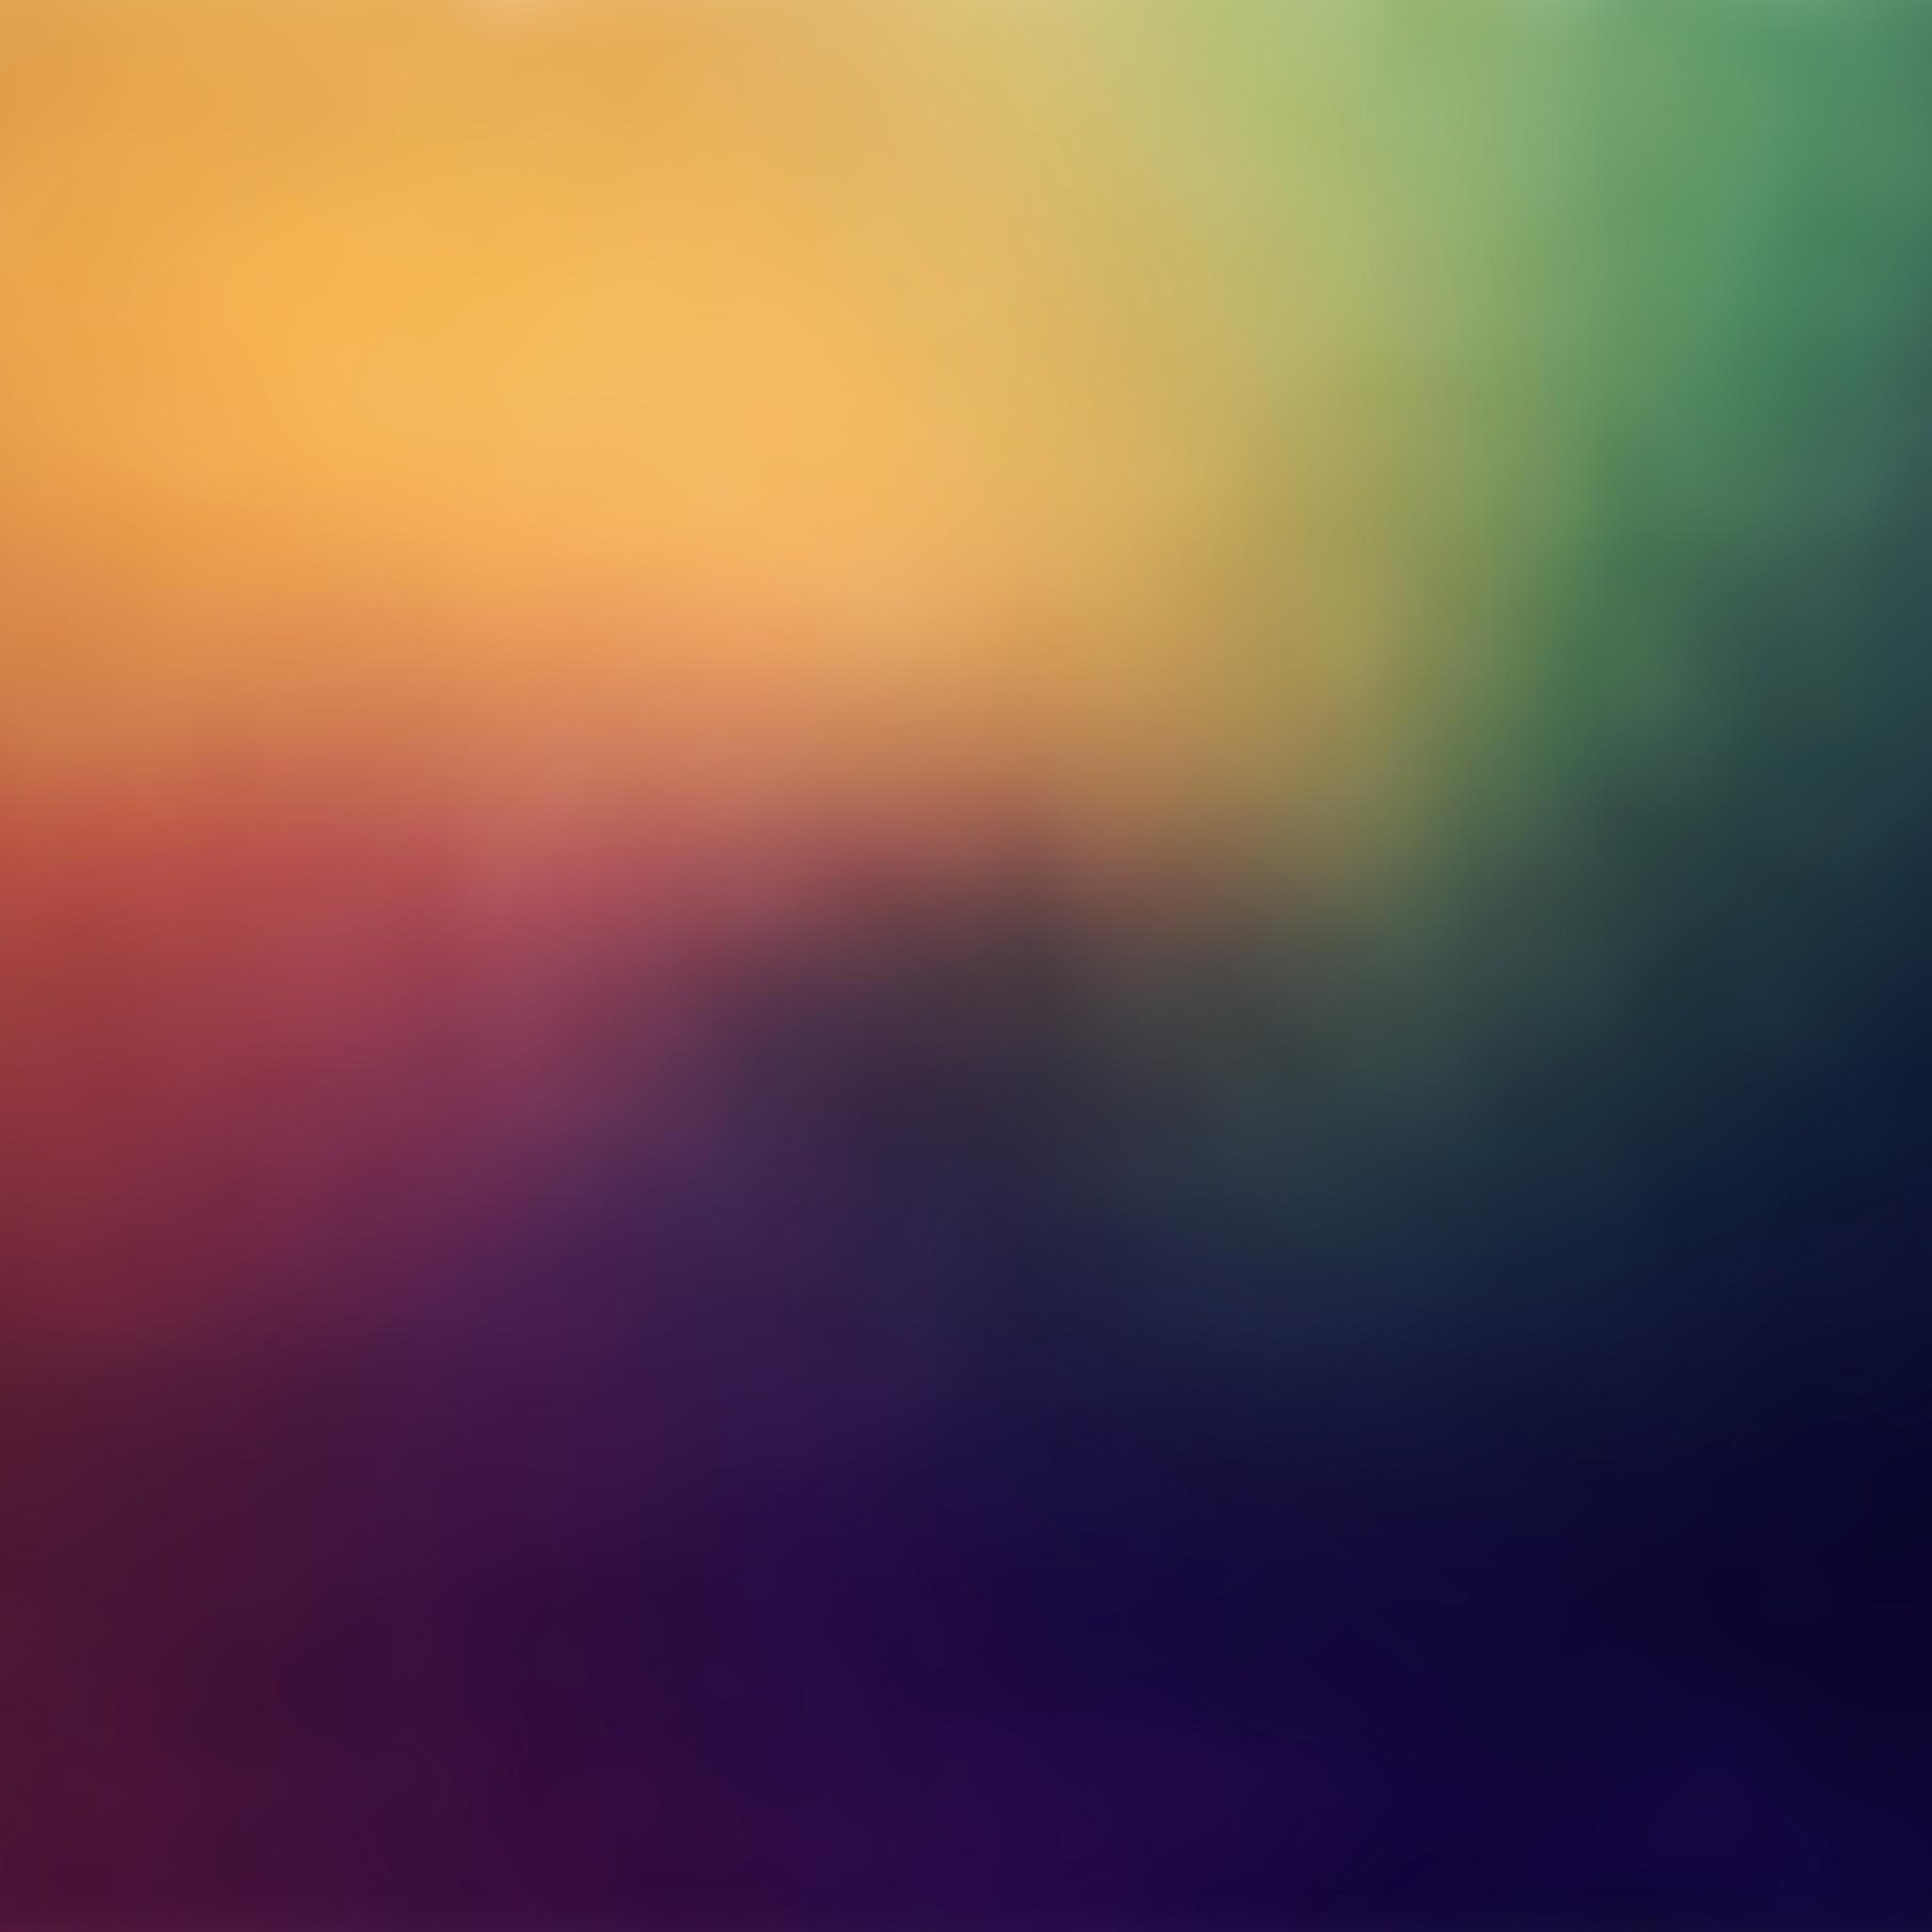 Rainbow-3Wallpapers-iPad-Retina